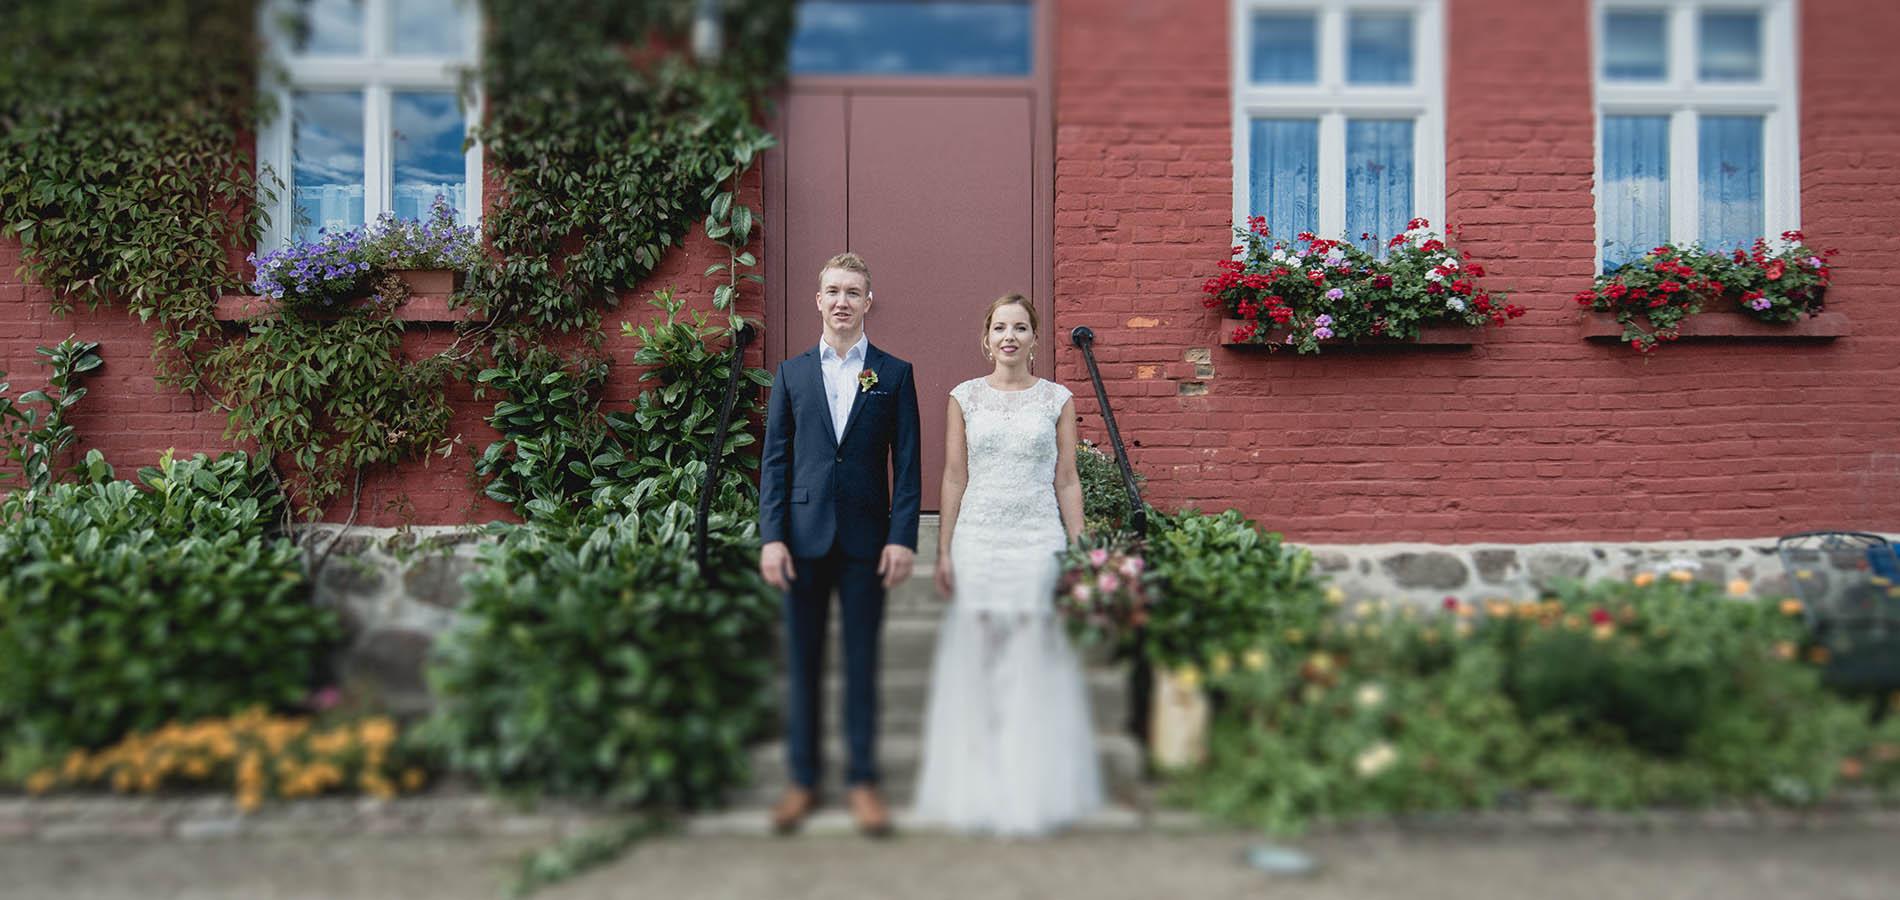 Hochzeit Im Rosendomizil Malchow